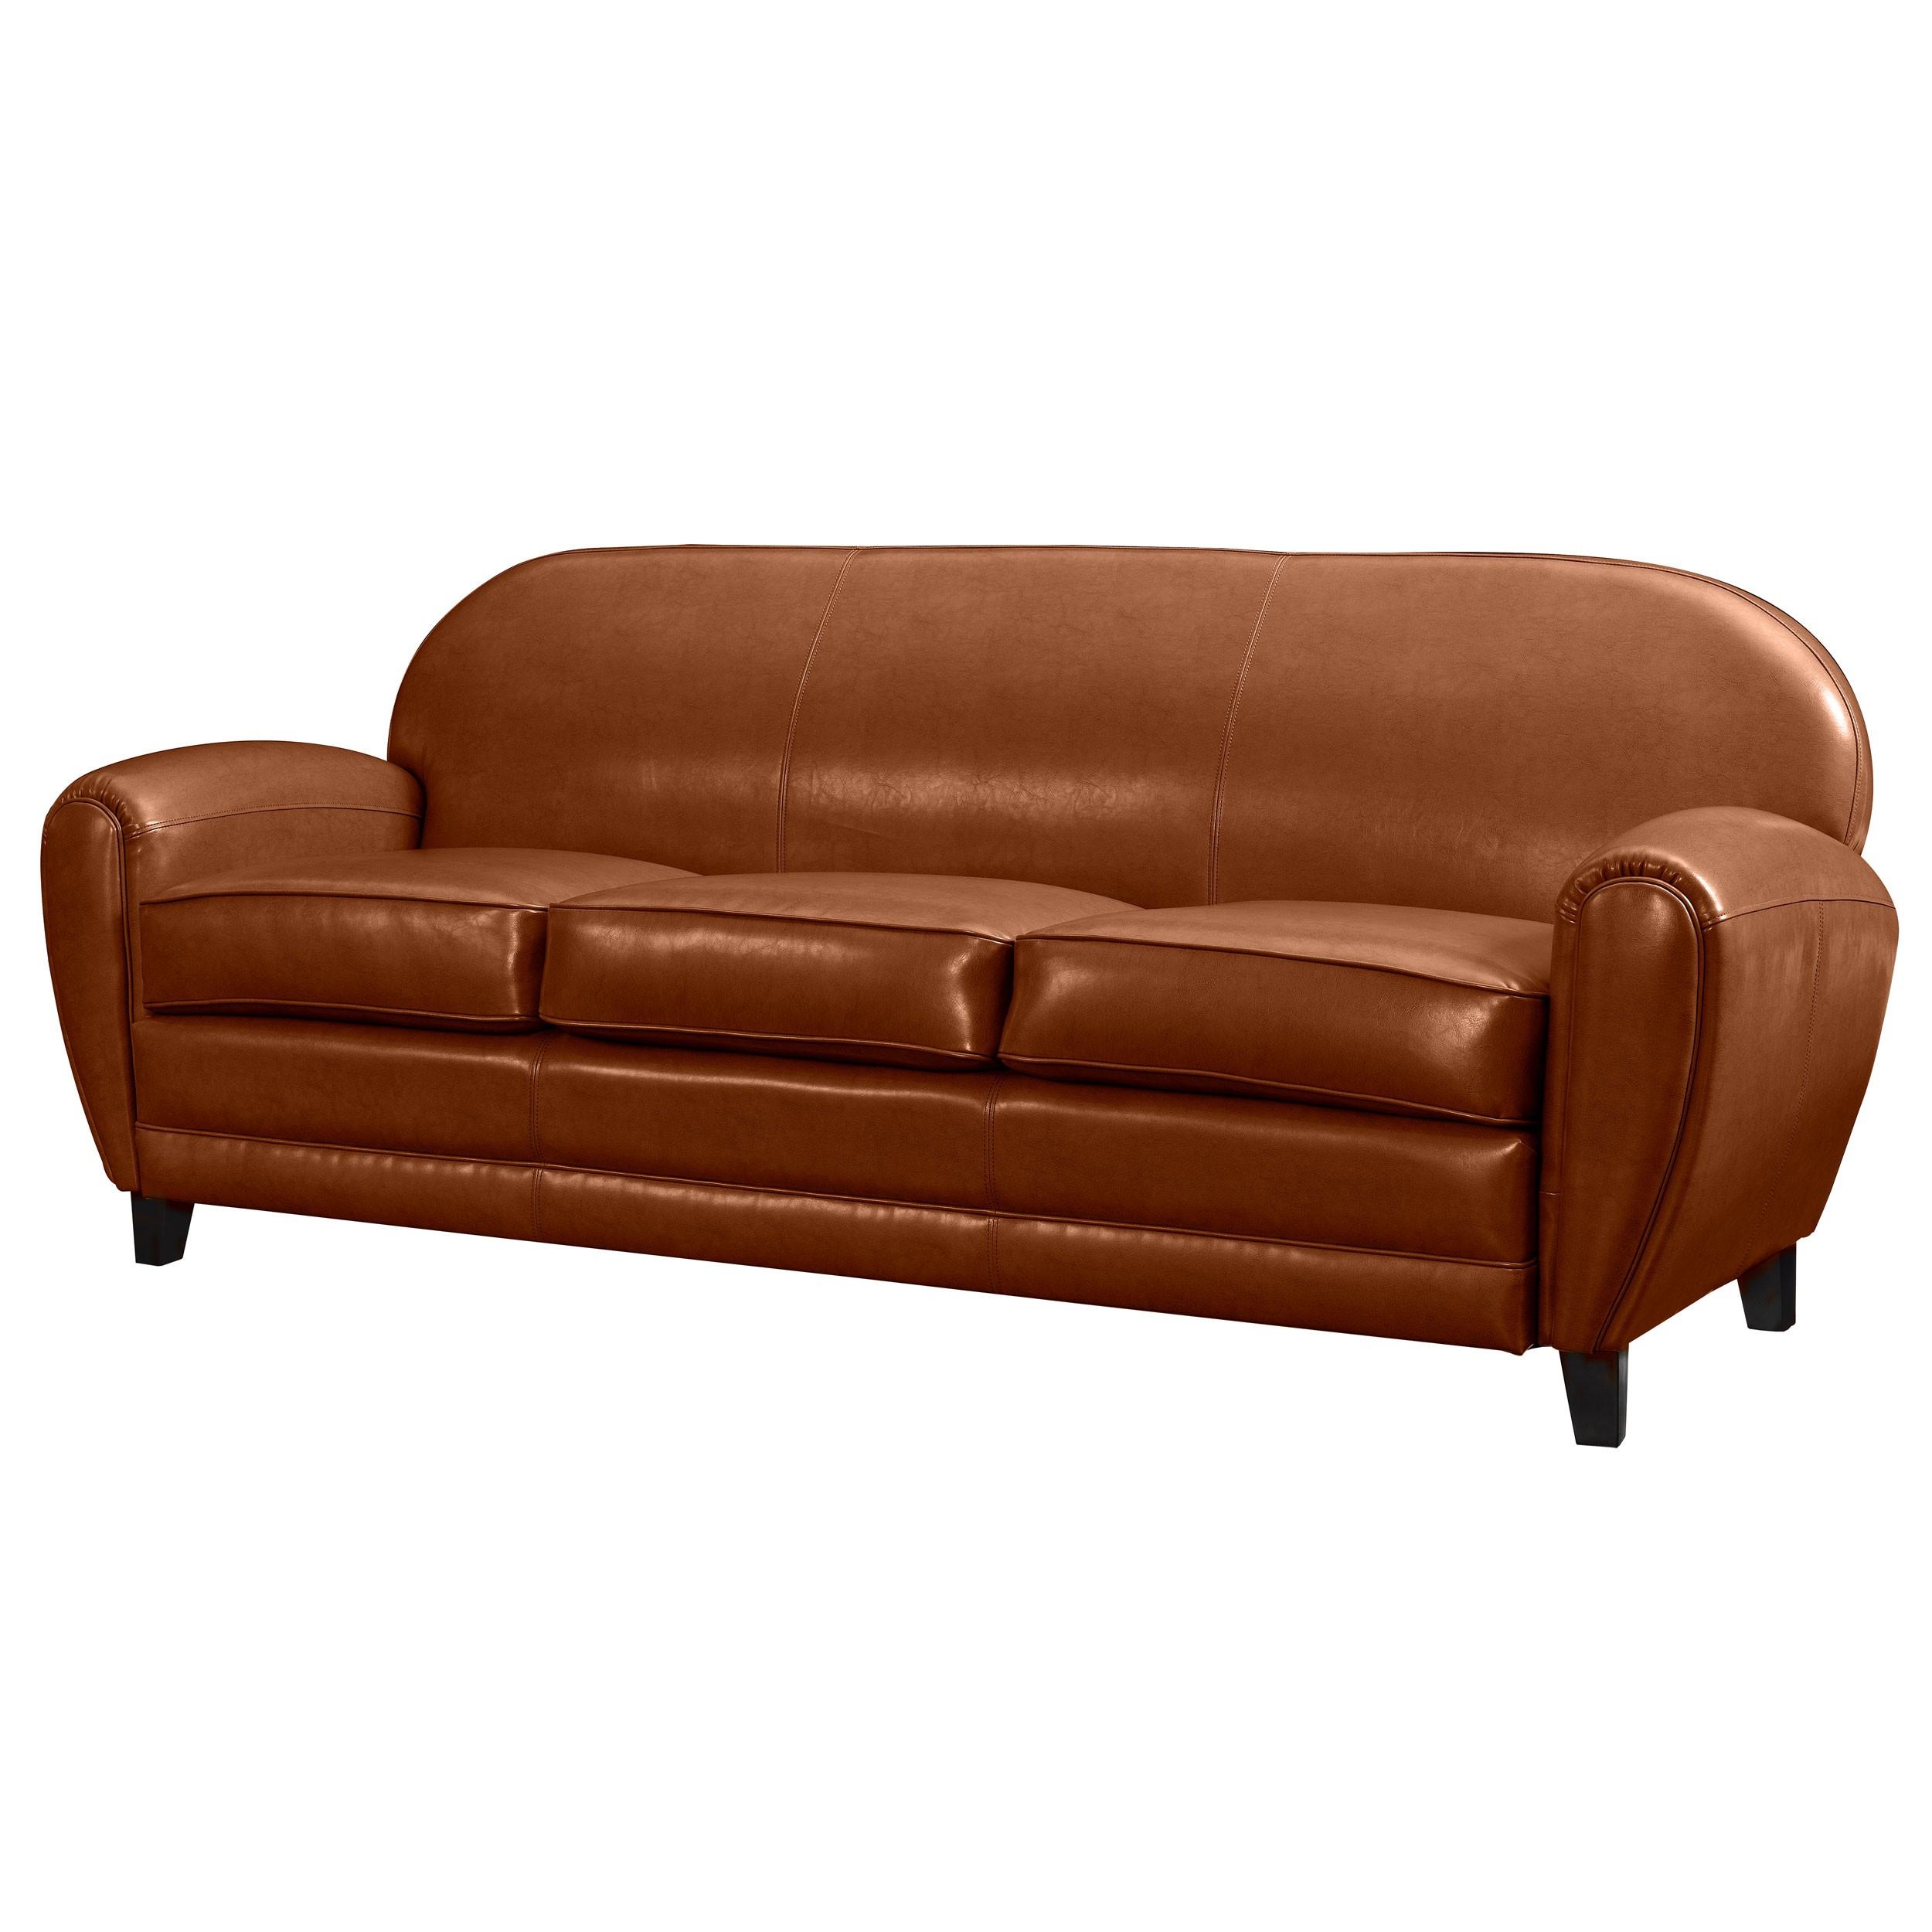 canap club 3 places cuir camel commandez nos canap s club 3 places cuir camel rdv d co. Black Bedroom Furniture Sets. Home Design Ideas